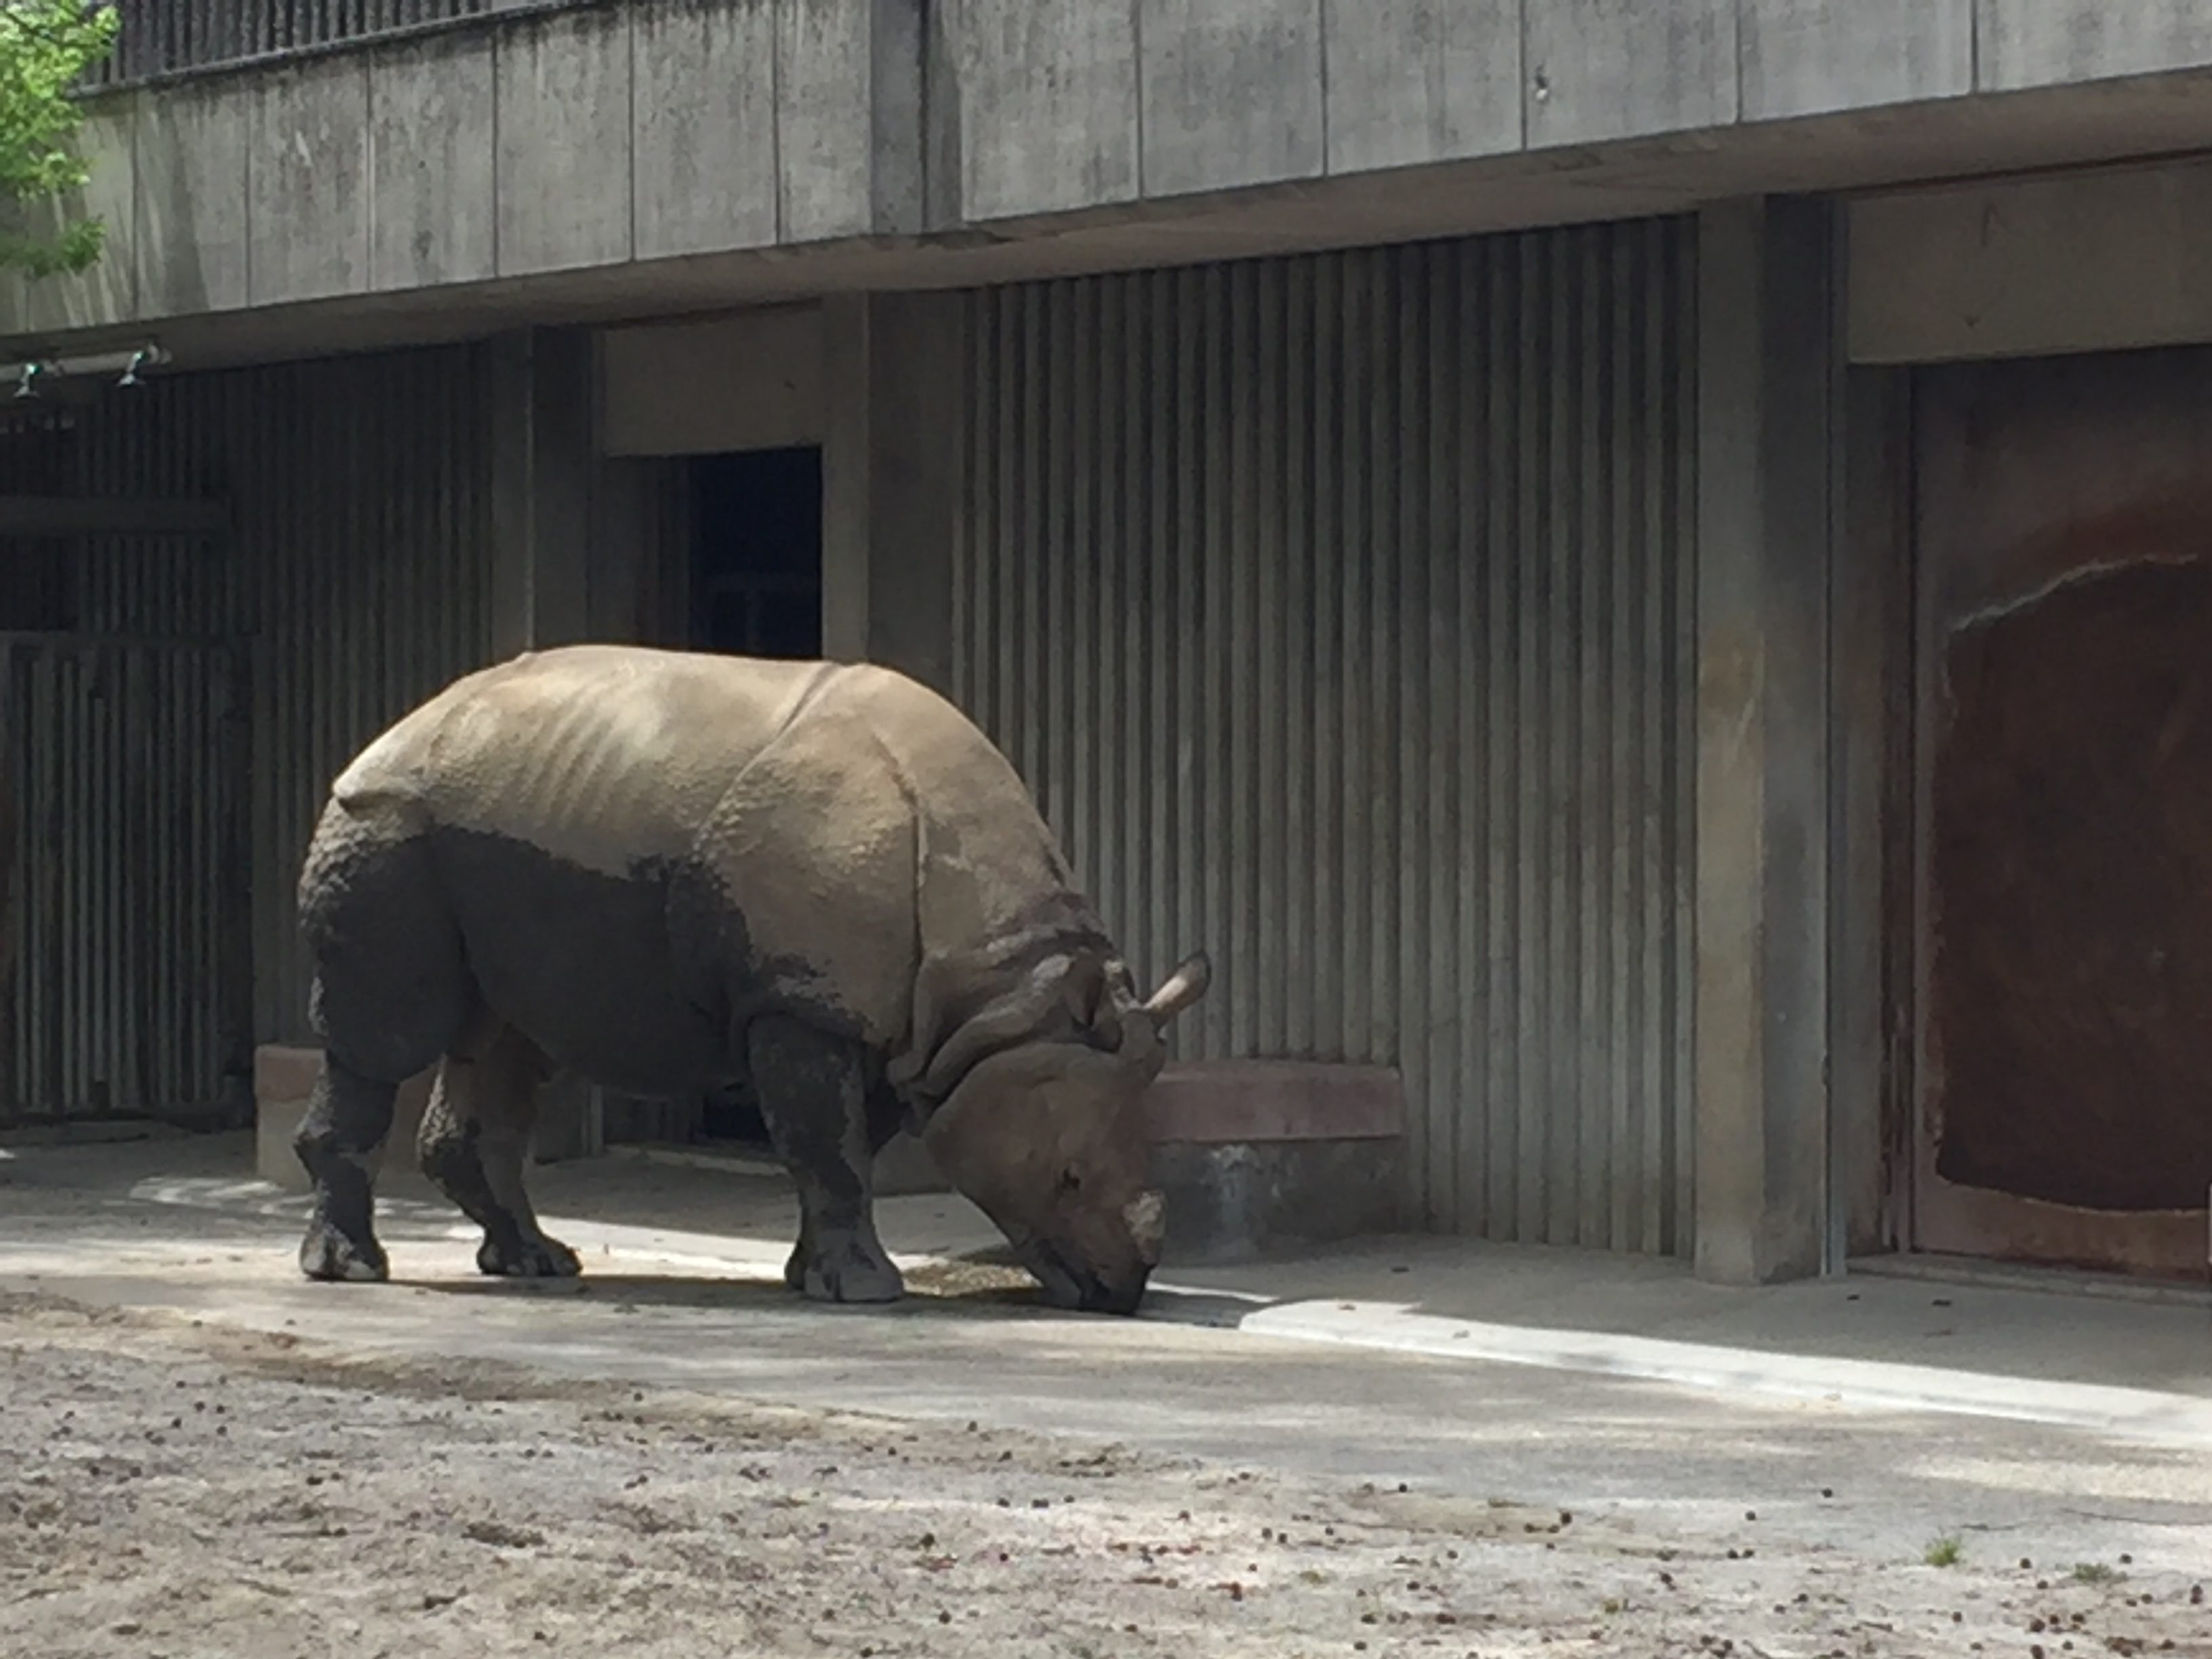 higashiyama-zoo-rhinoceros